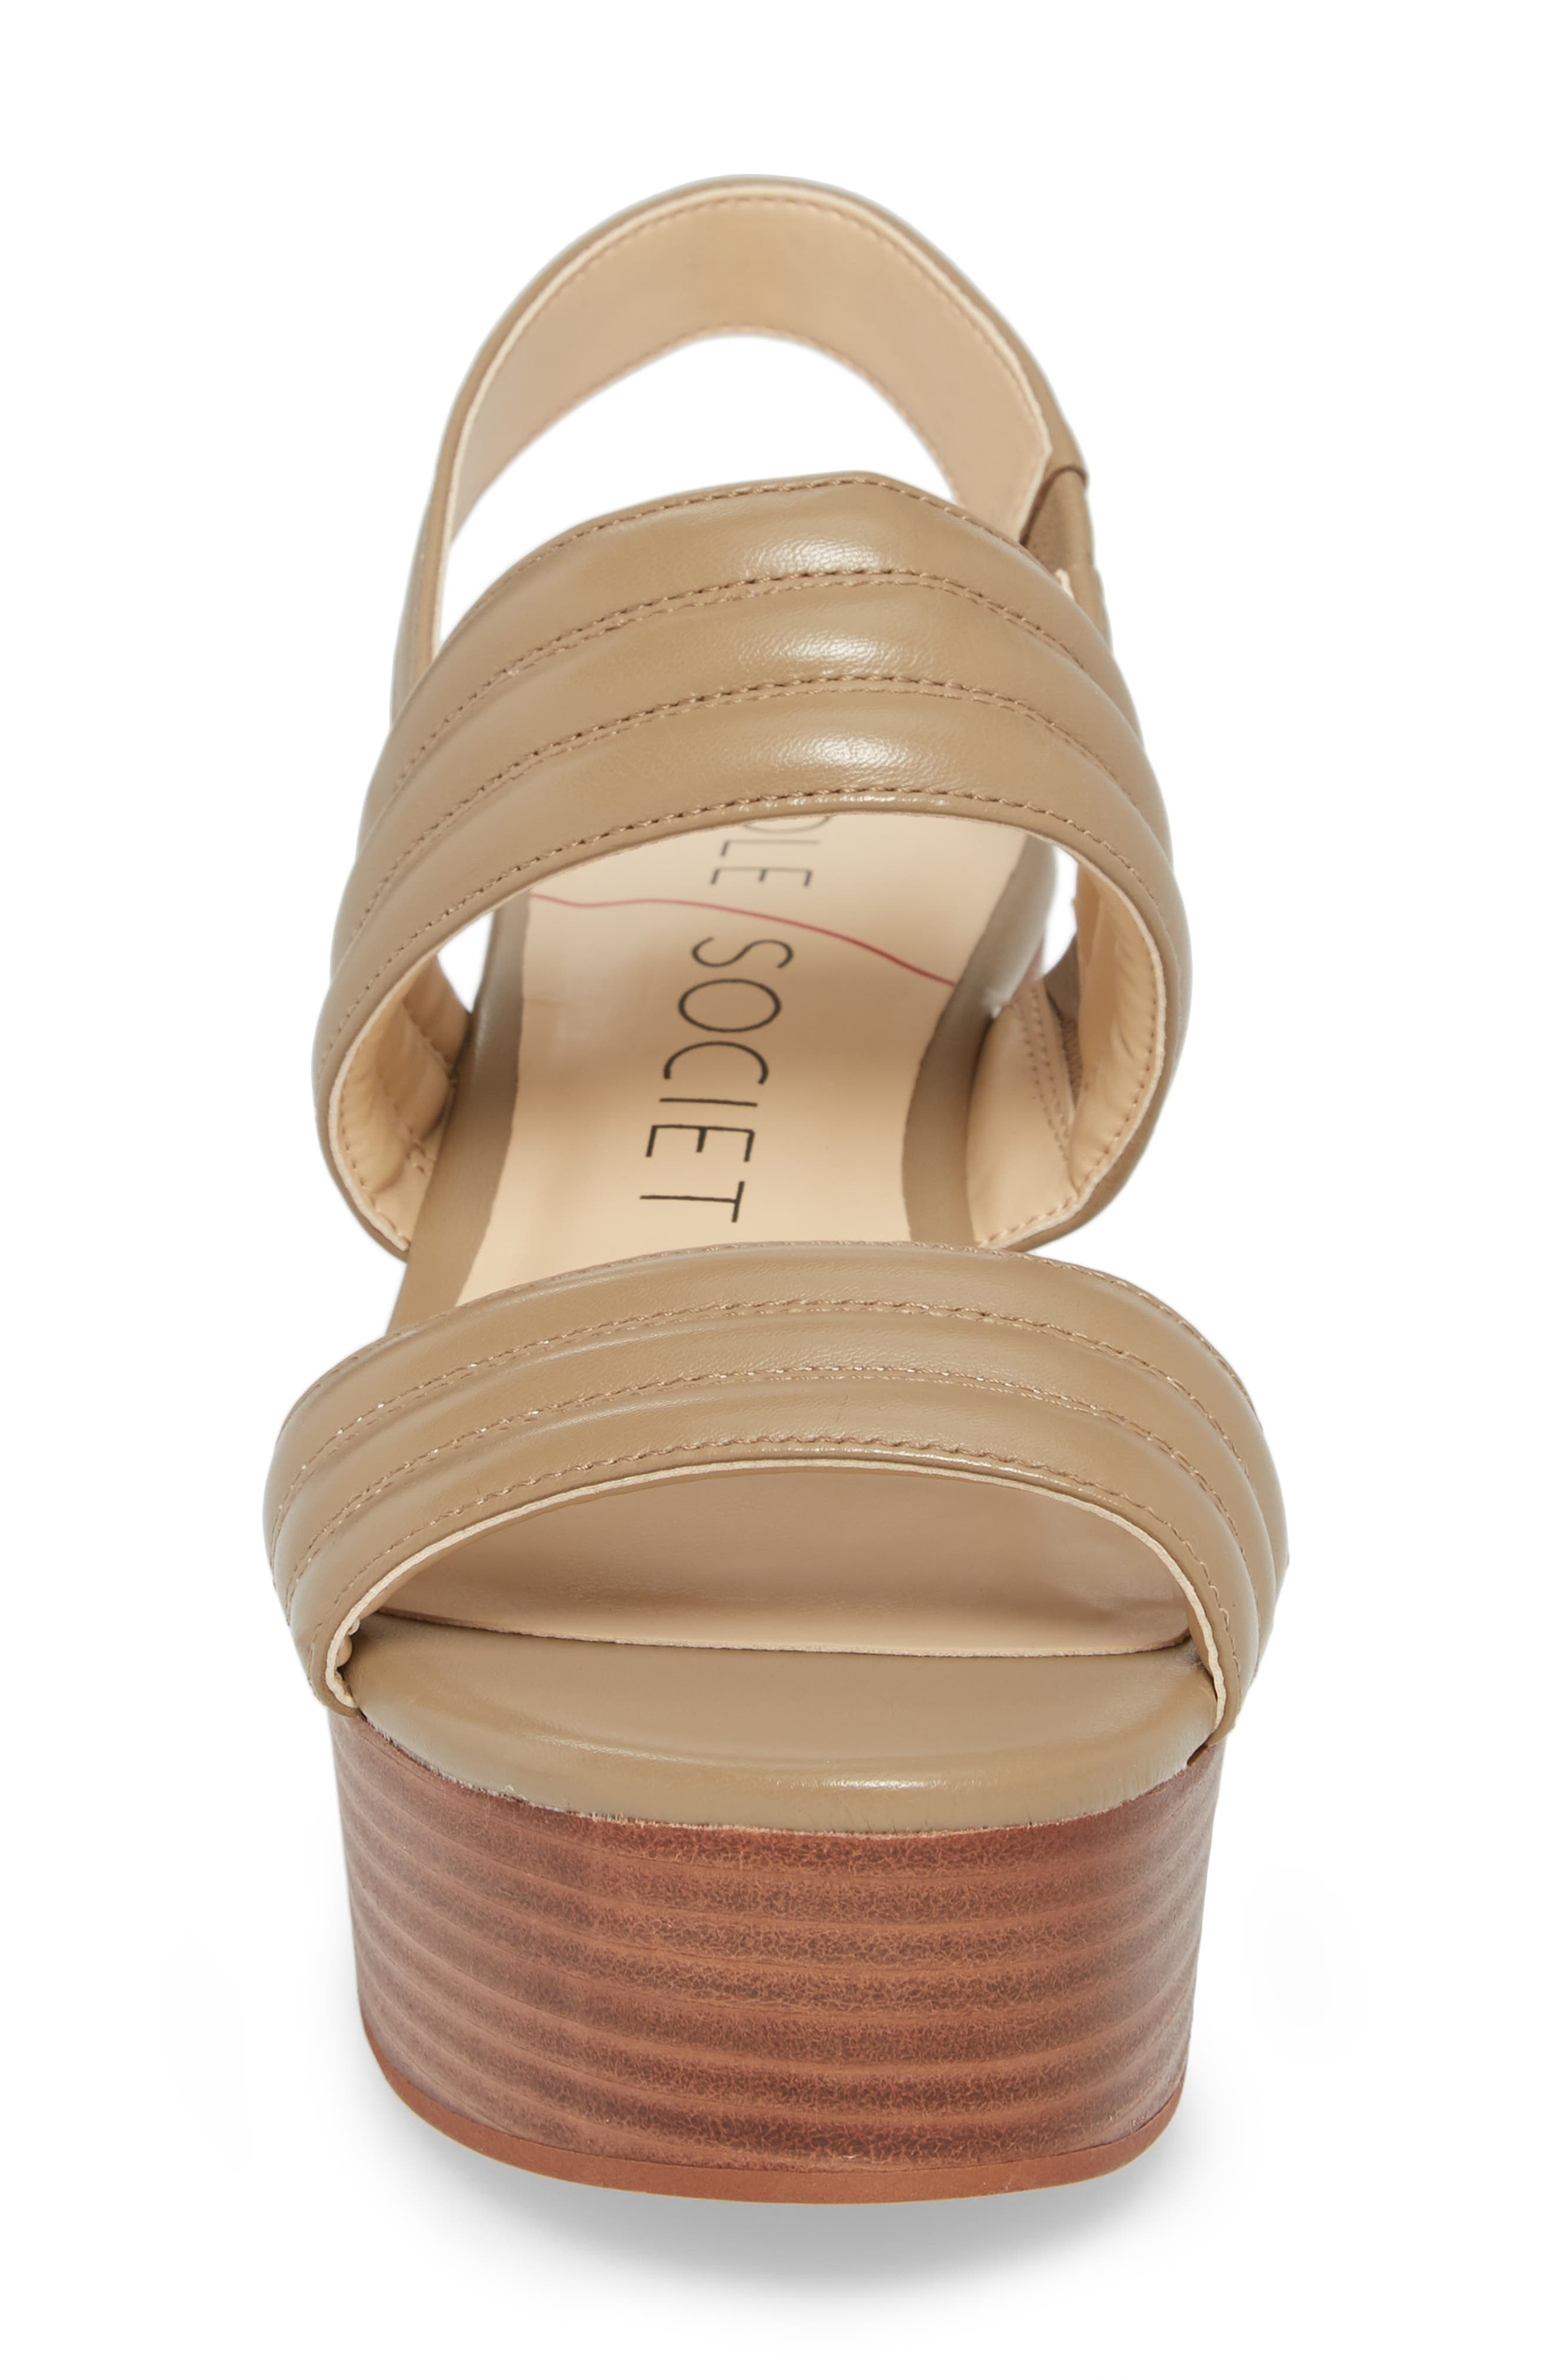 Amberly Platform Sandal,                             Alternate thumbnail 4, color,                             200